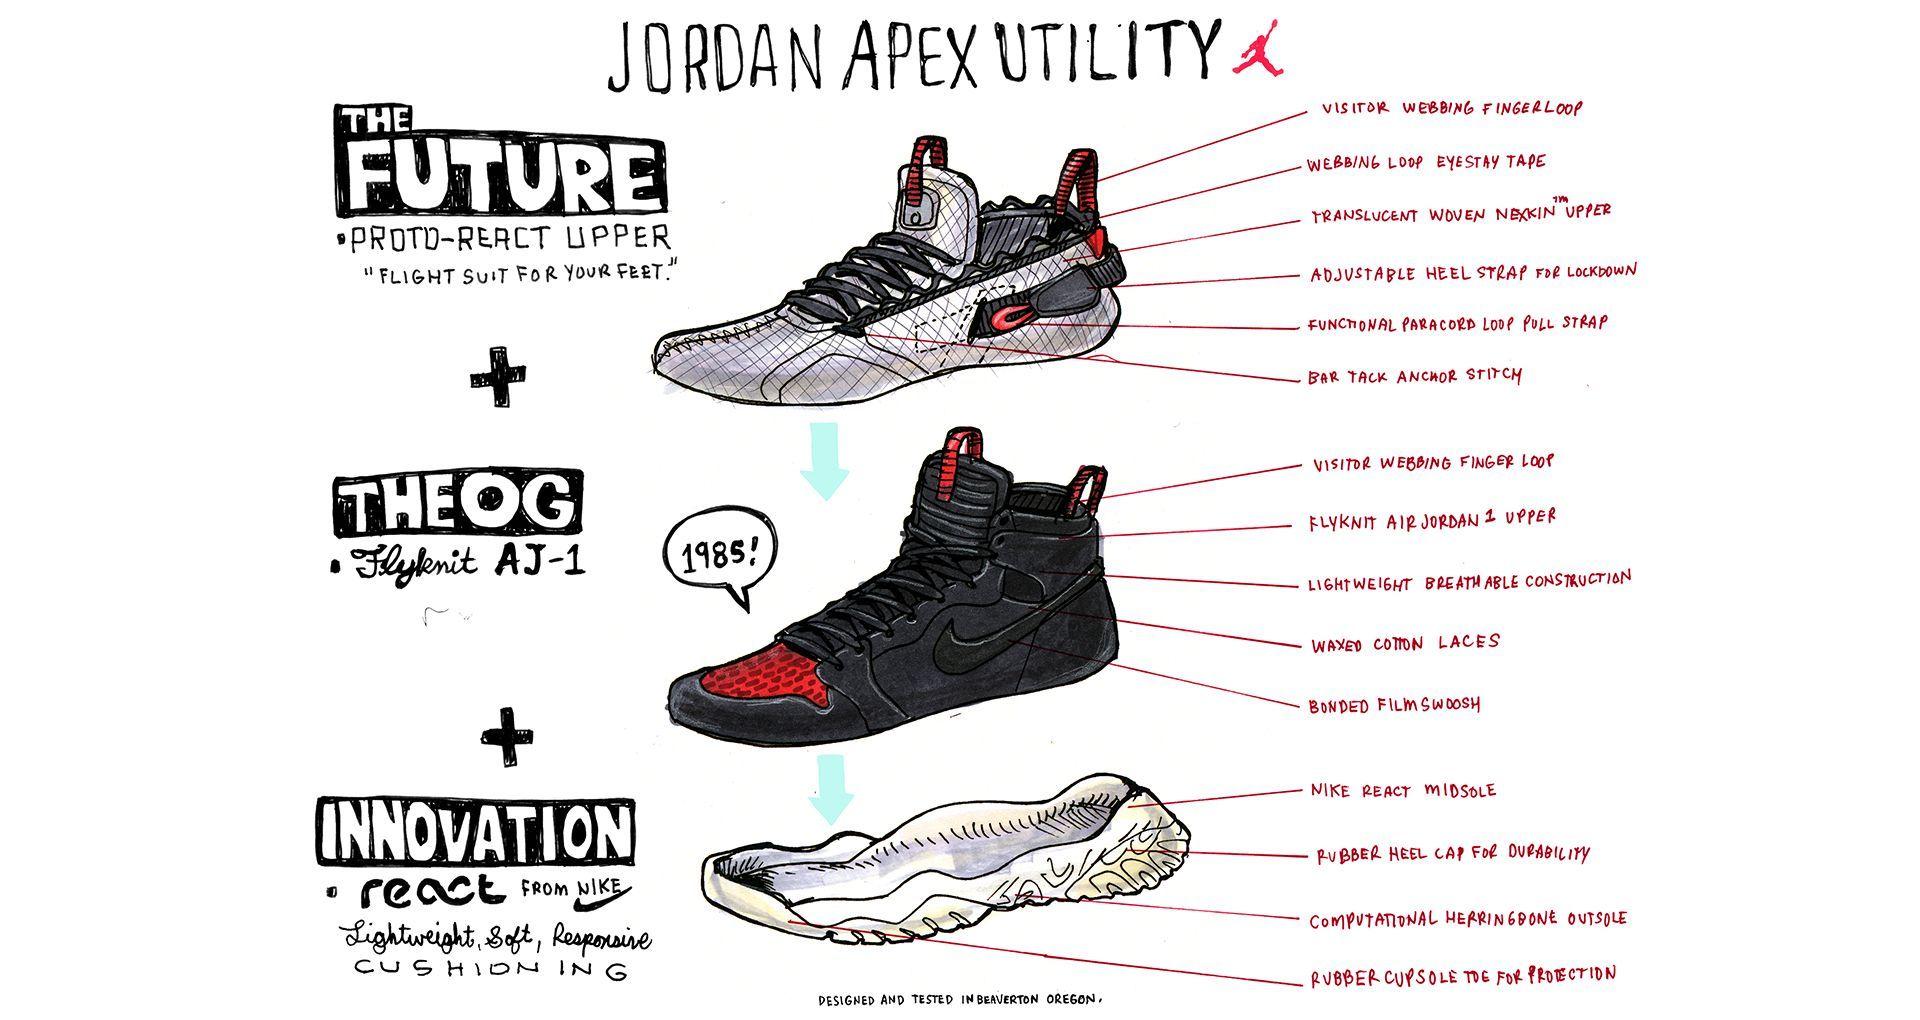 jordan apex utility for sale